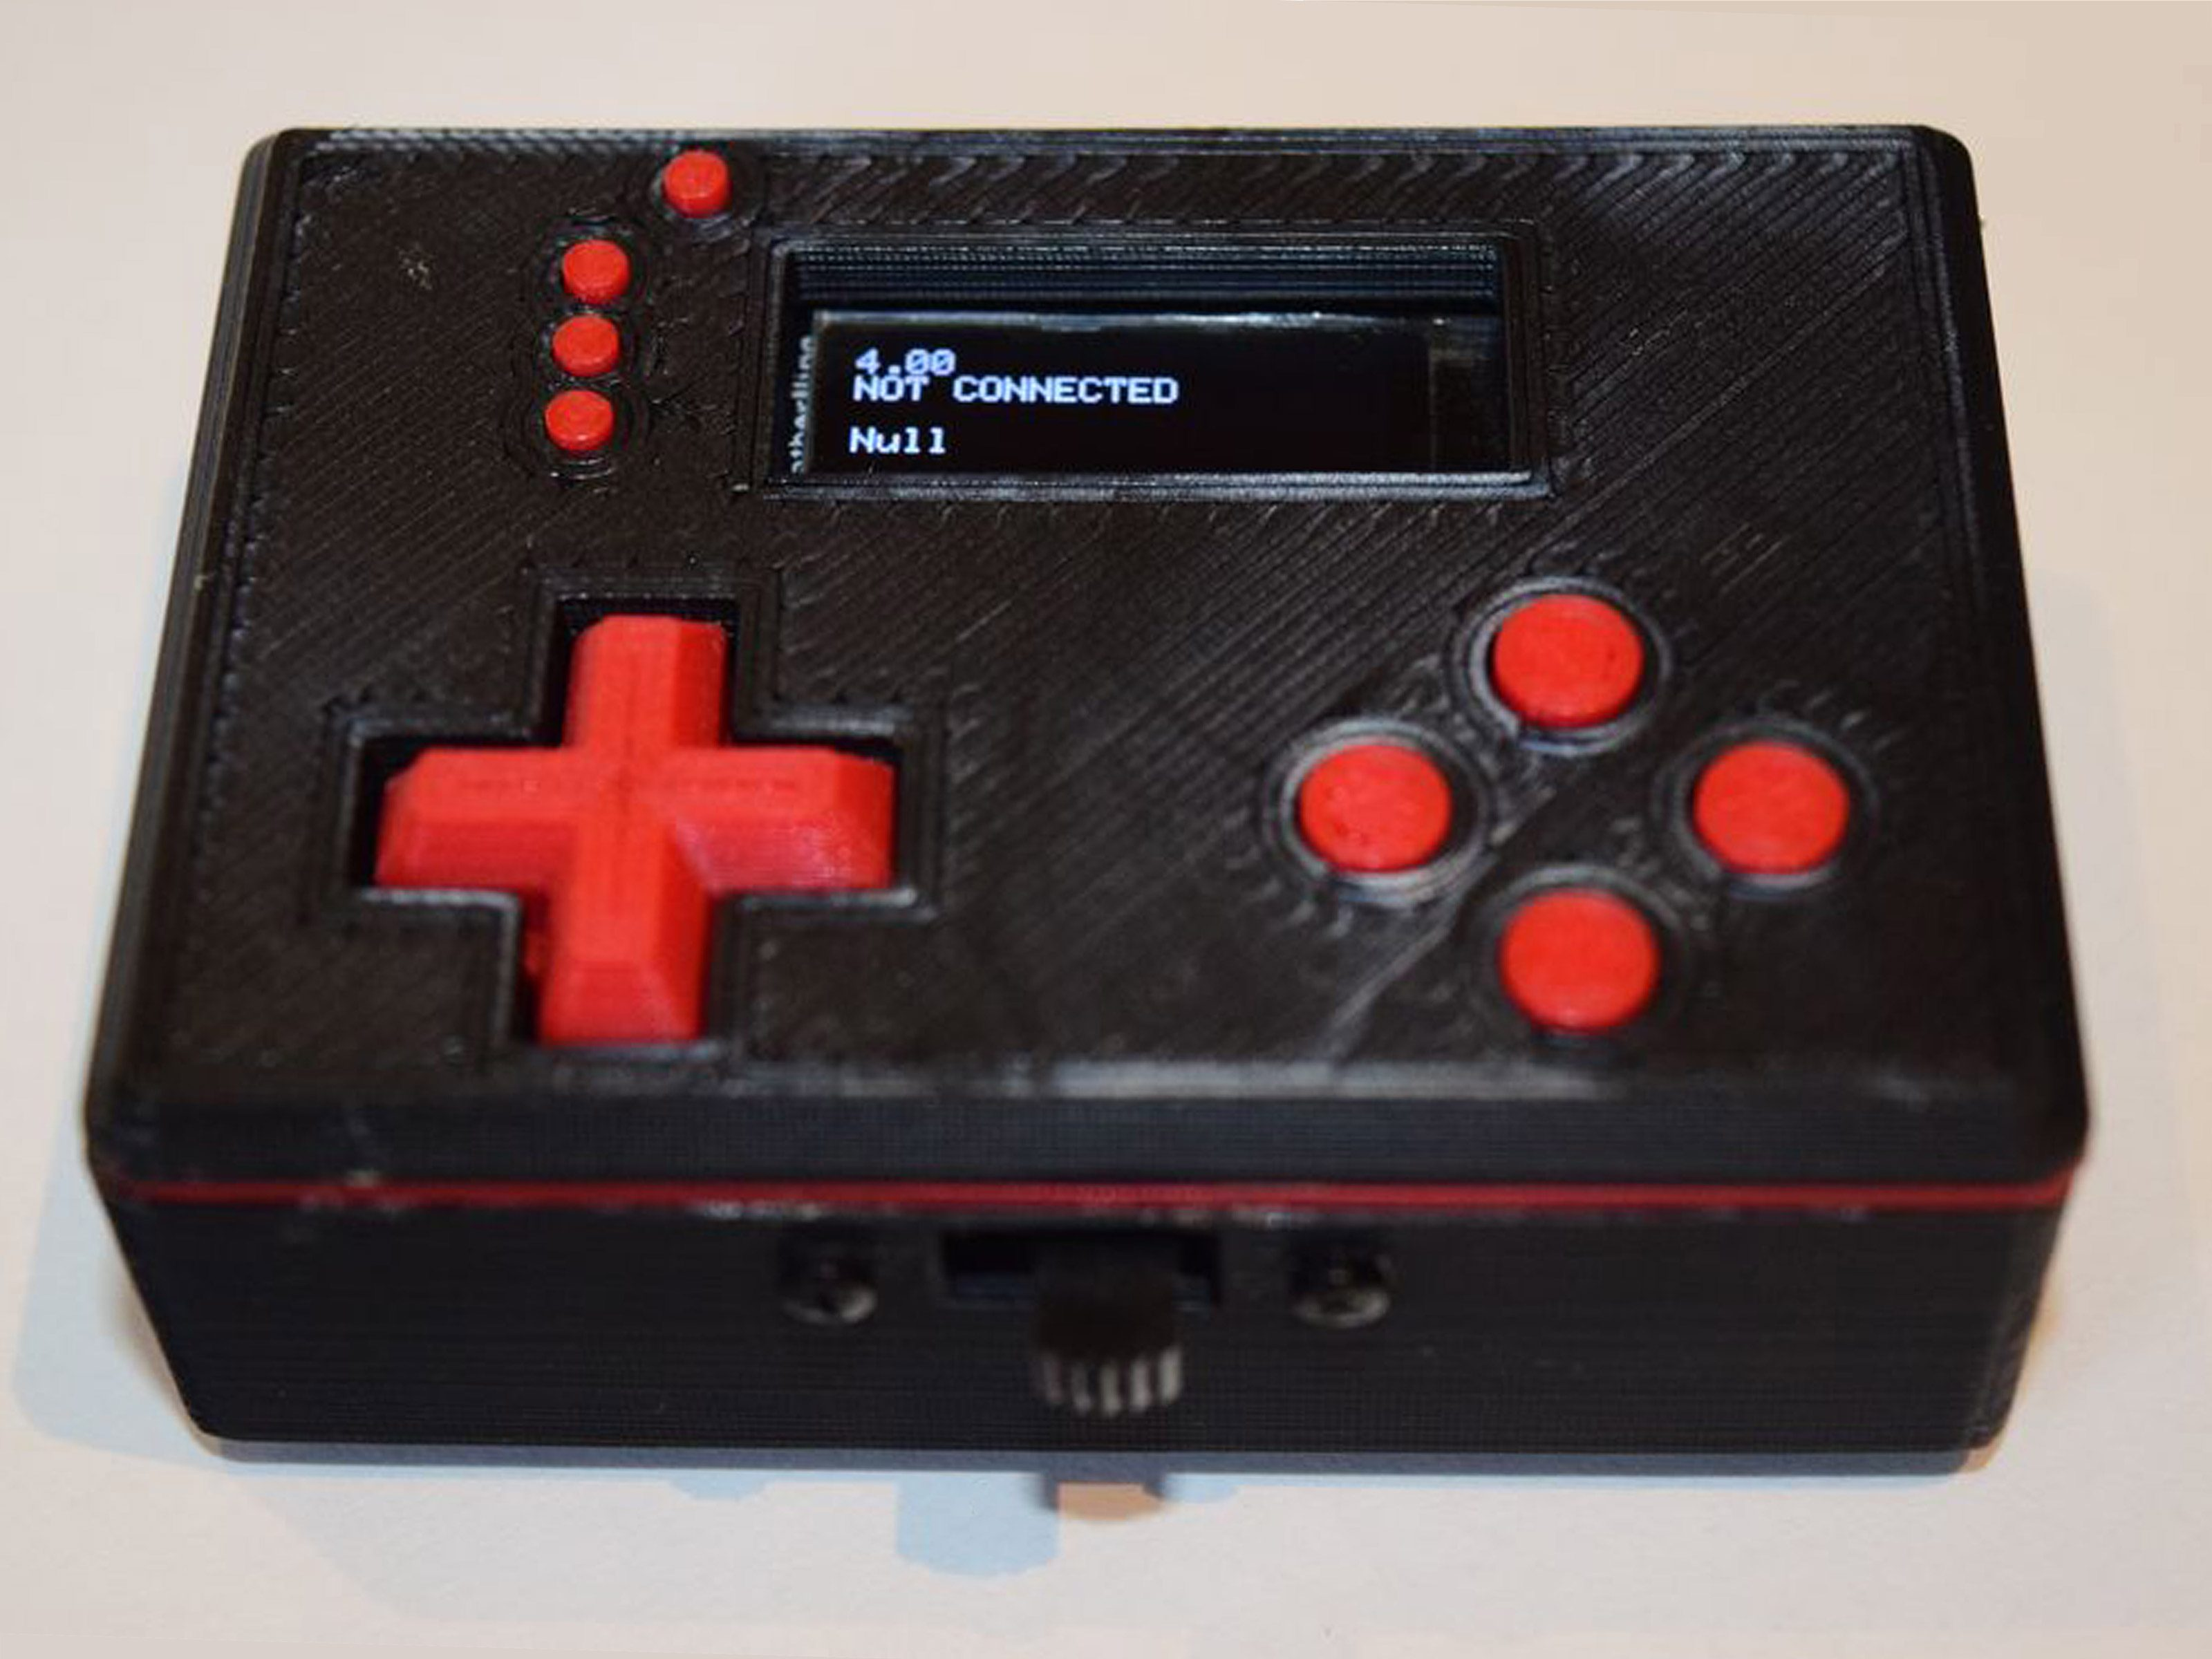 Nano gamepad